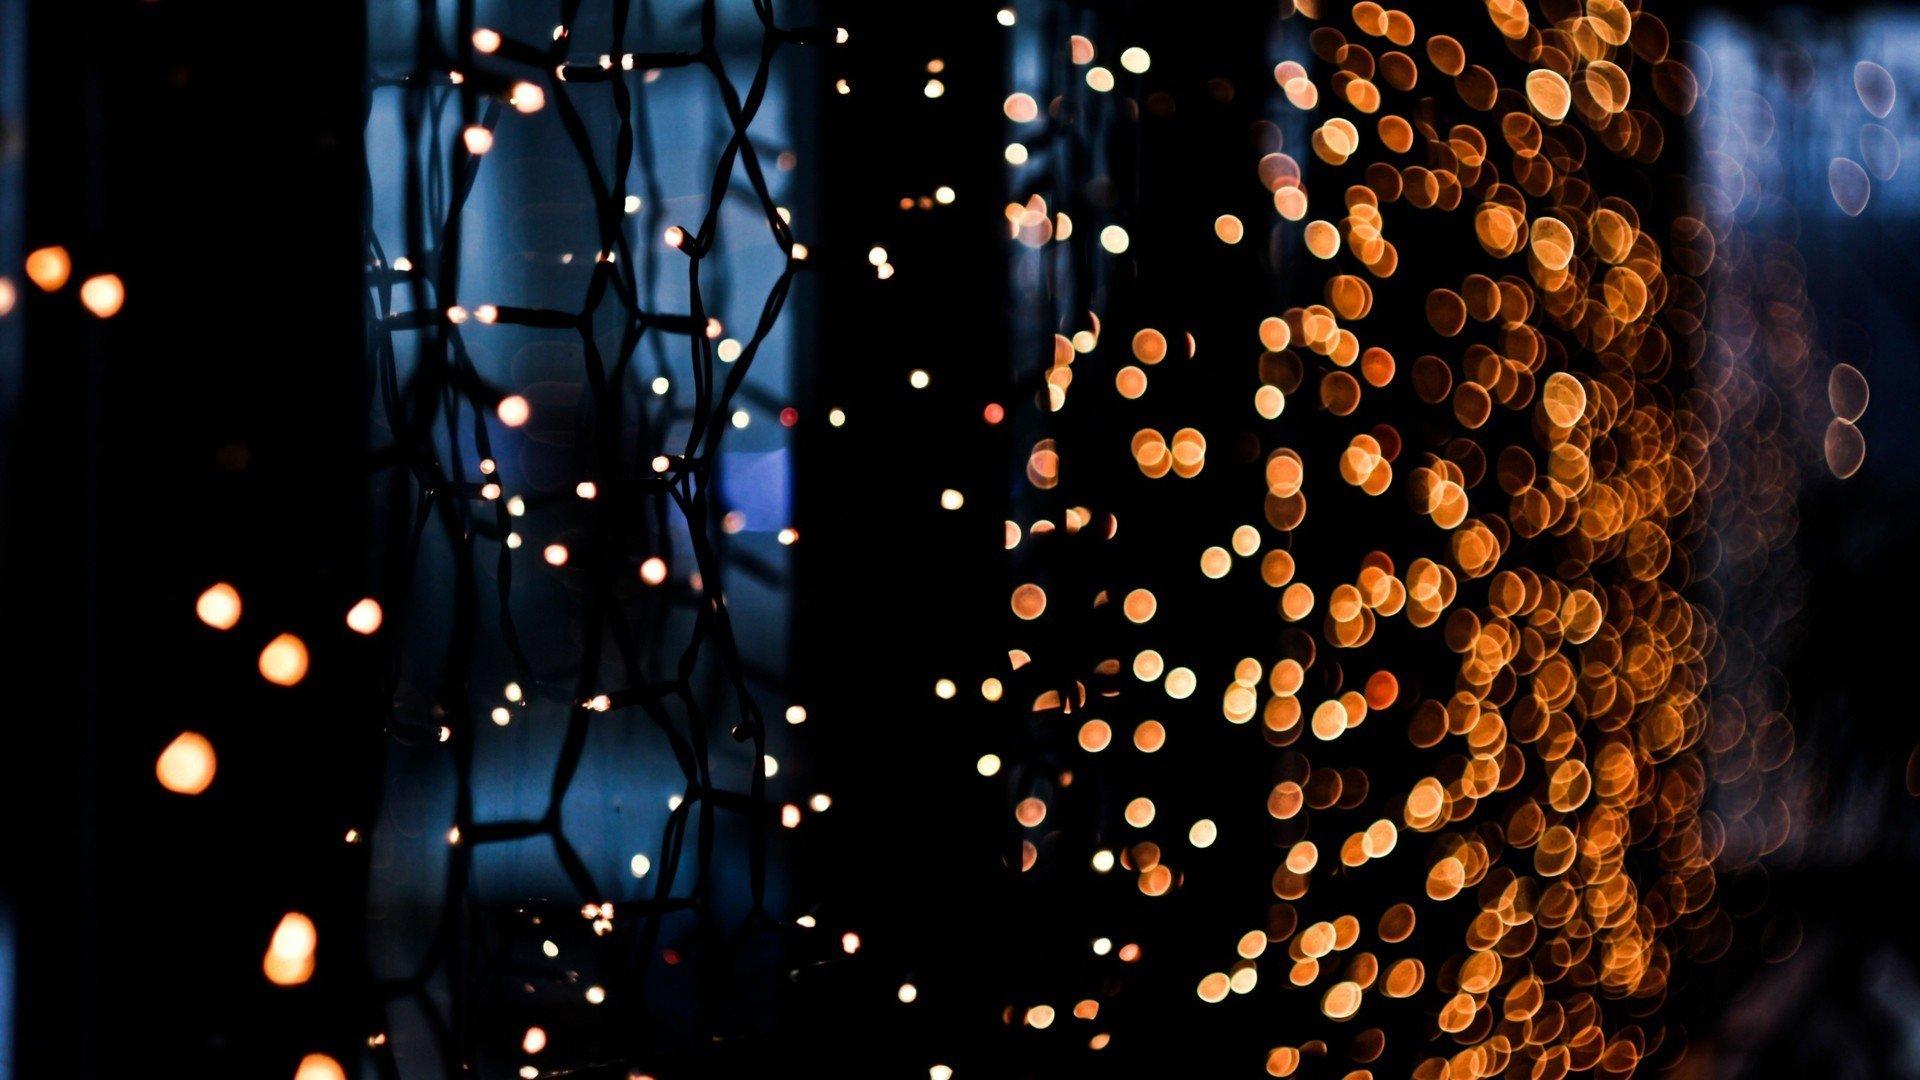 Aesthetic Christmas Background Full HD